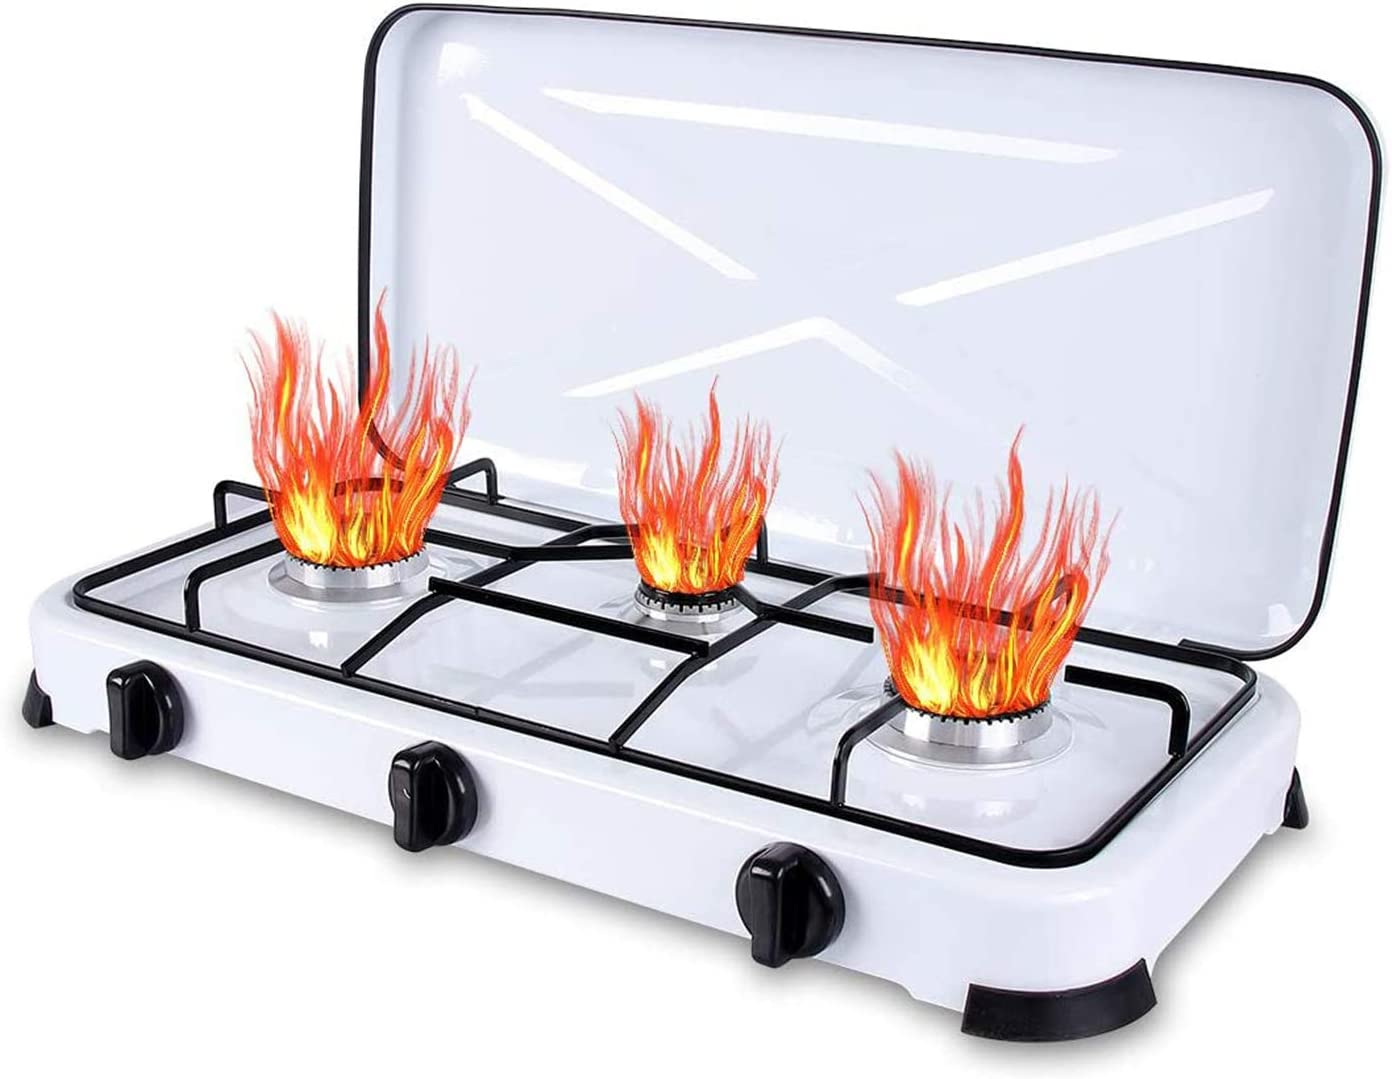 Qdreclod Camping Cocina de Gas 3 Quemadores con Tapa, Quemadores de Cocina de Gas a Prueba de Viento Al Aire Libre,Apta para Macetas de Miferentes ...